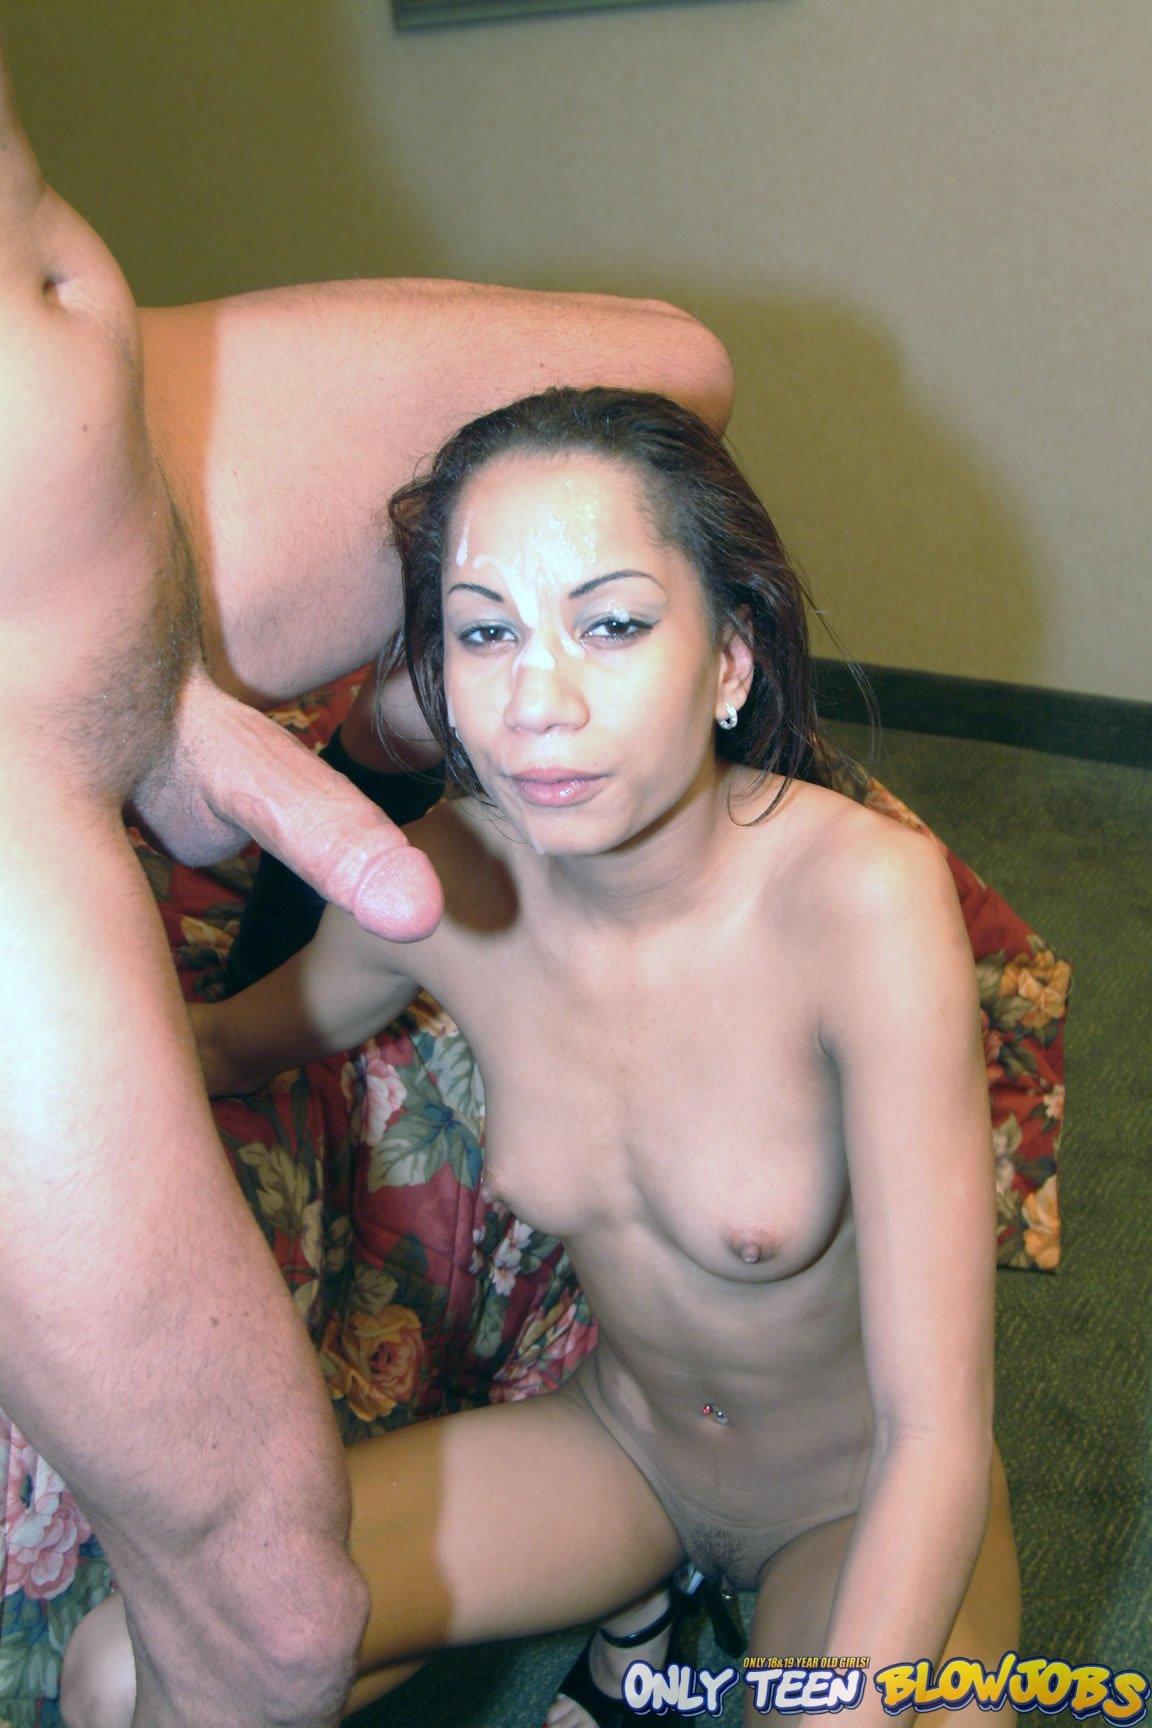 Спермой в глаз - Порно фото галерея 752343